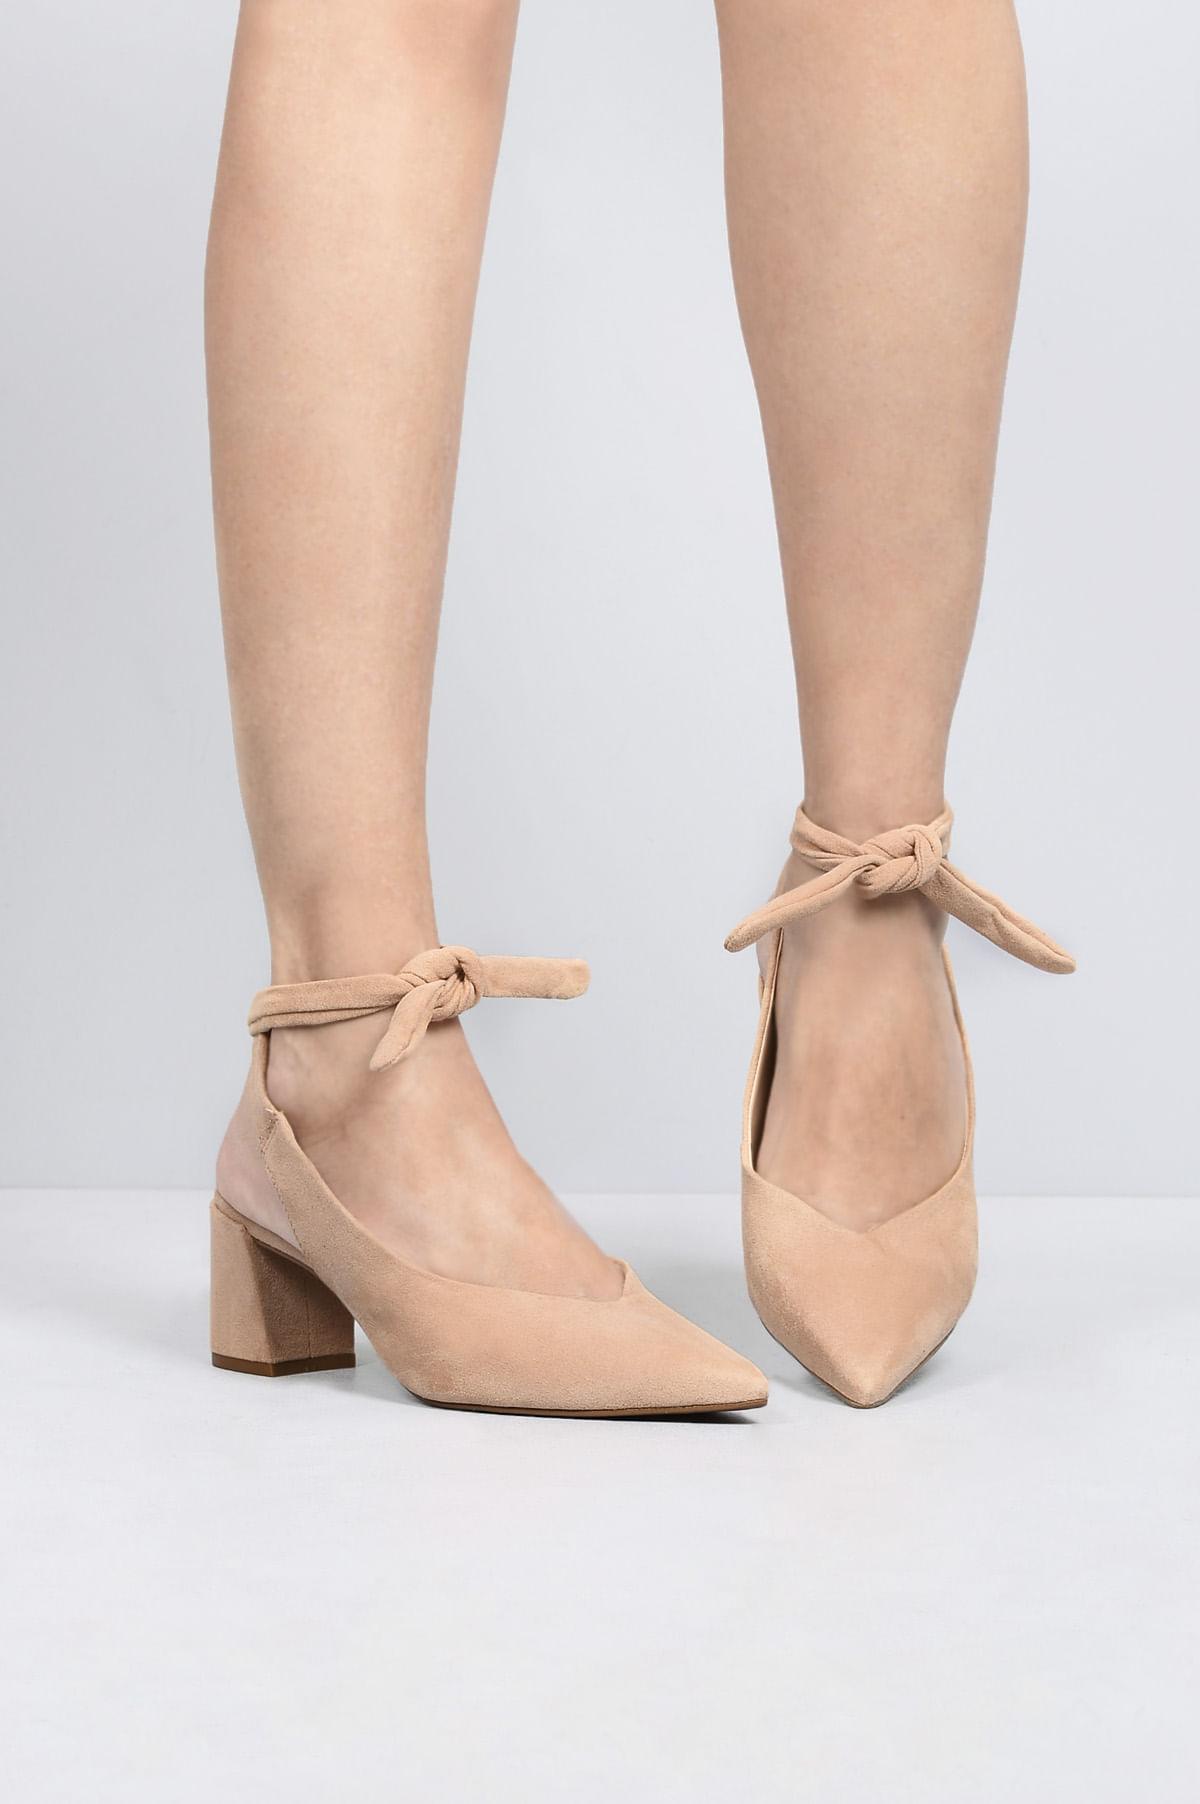 80385bdd9 Sapato Feminino Salto Médio Miley Mundial CAM - NUDE - Mundial Calçados